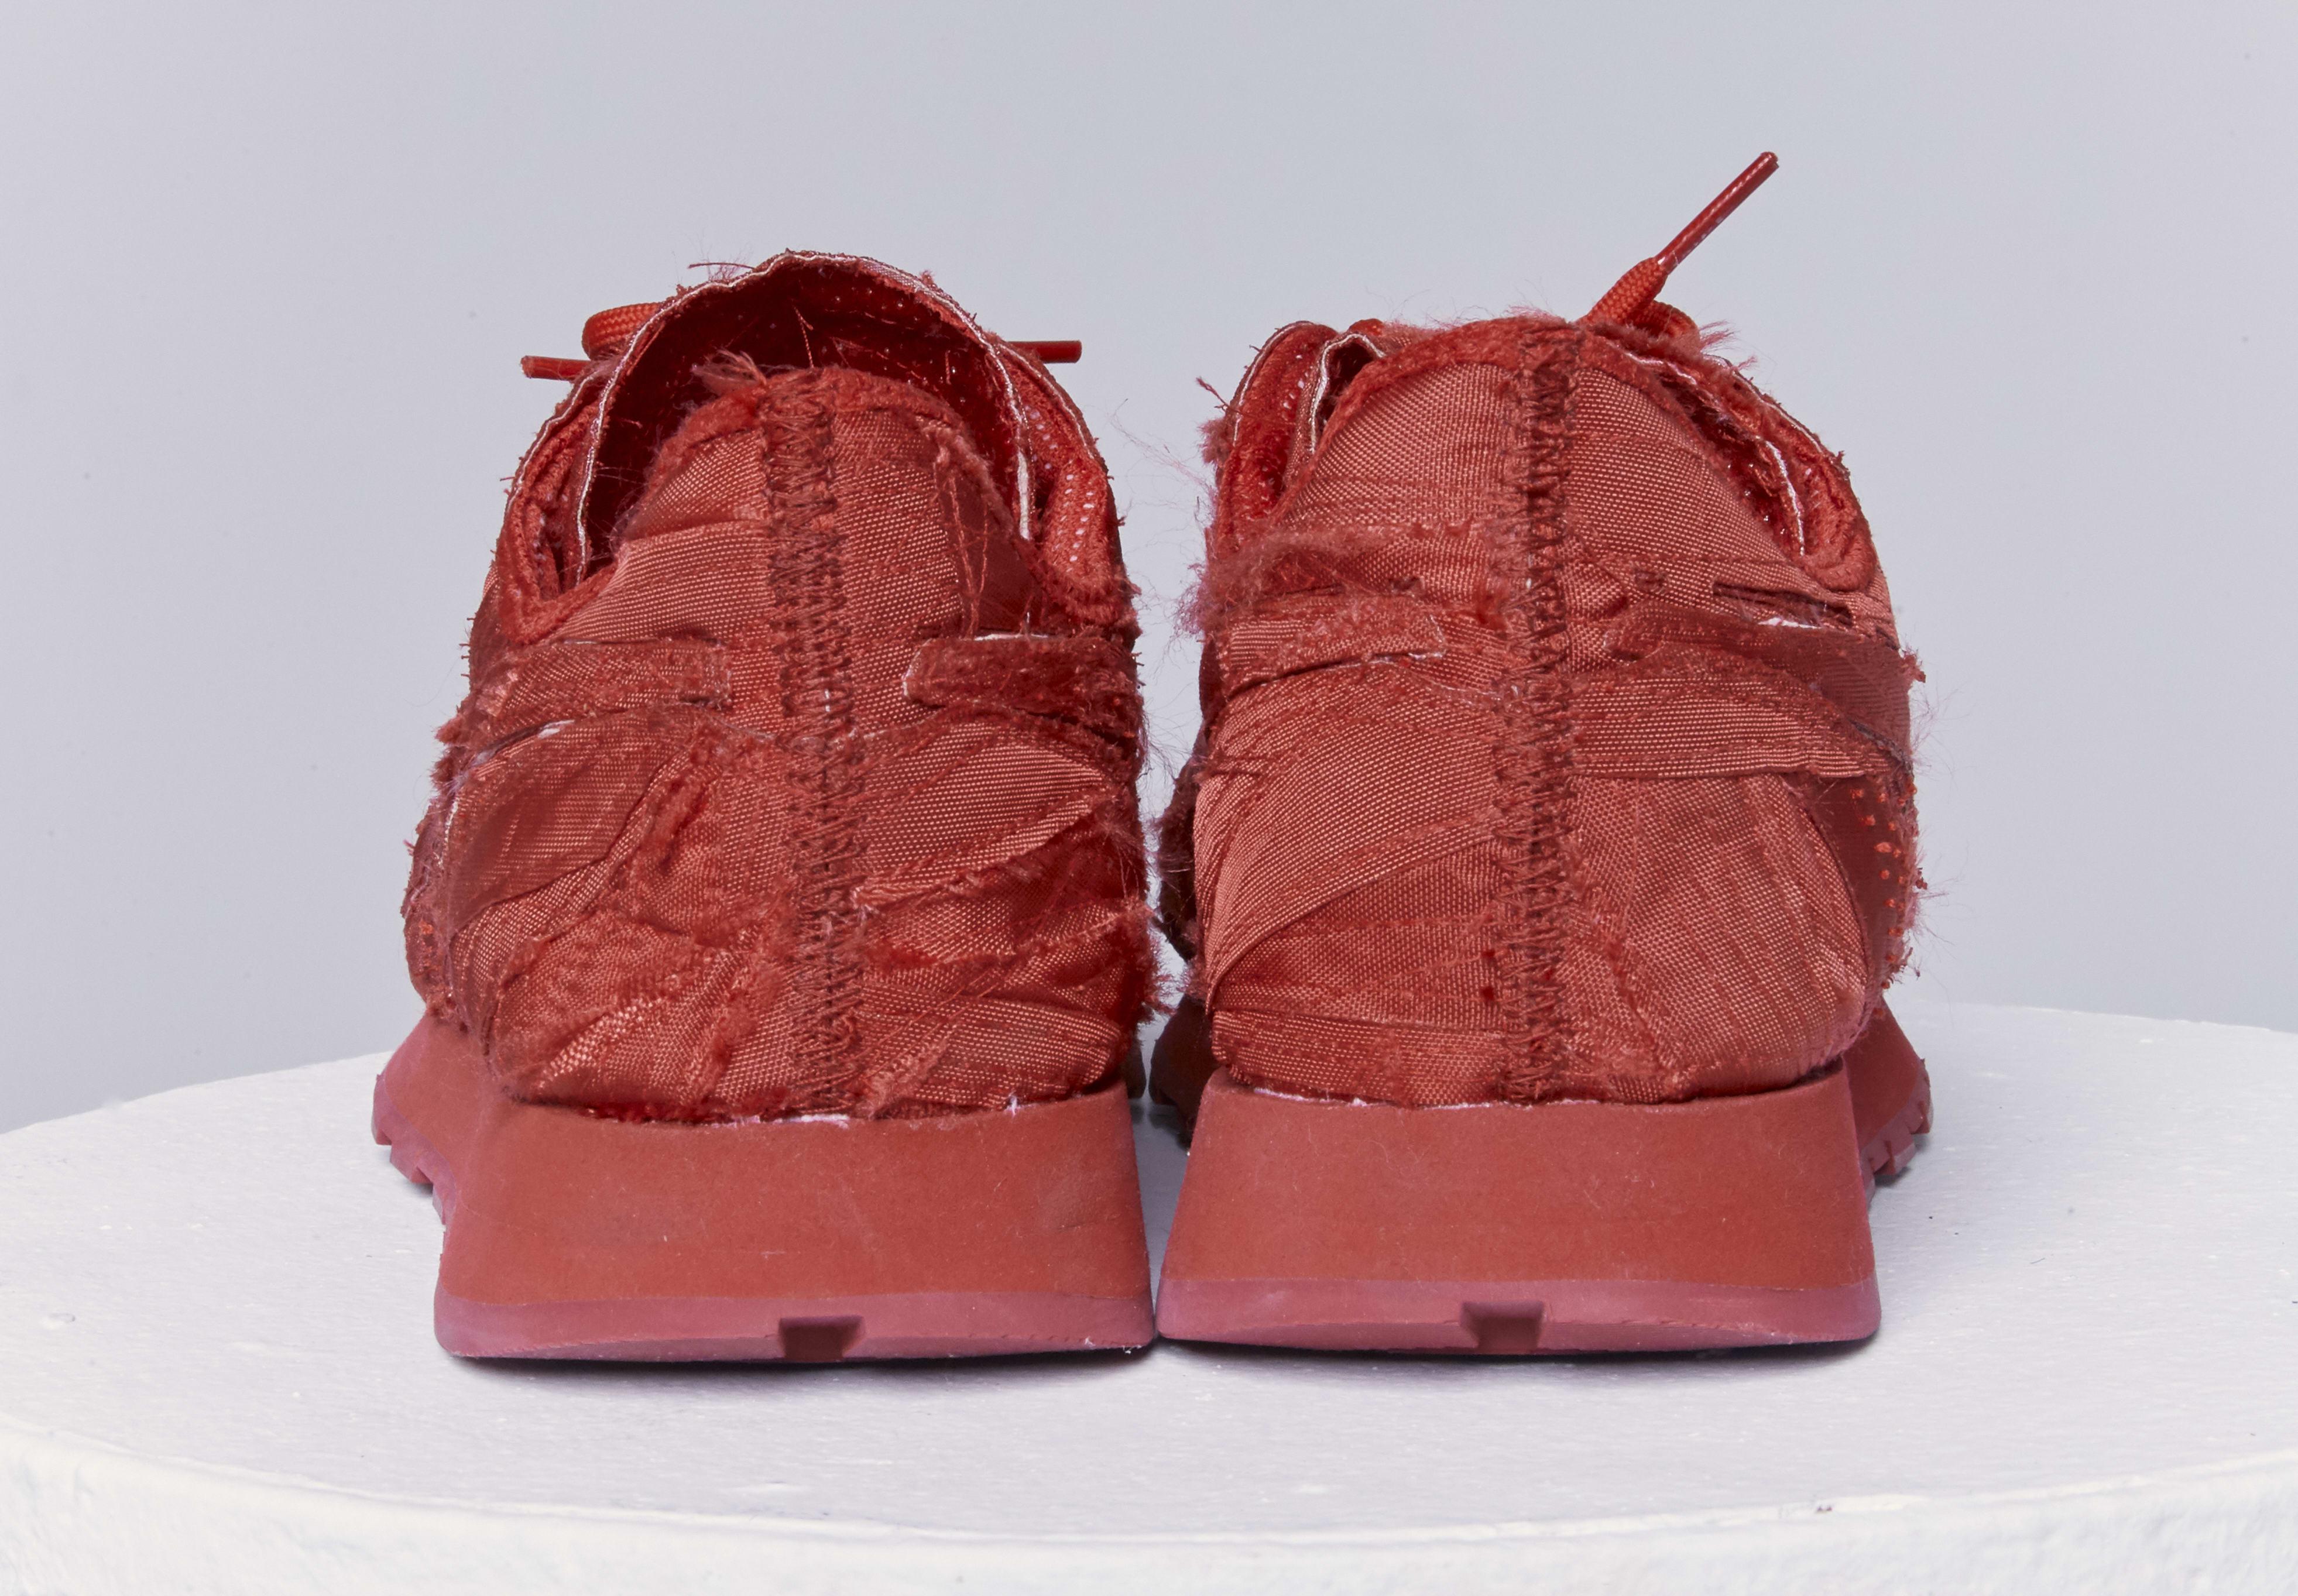 Kanghyuk x Reebok Classic Leather Heel